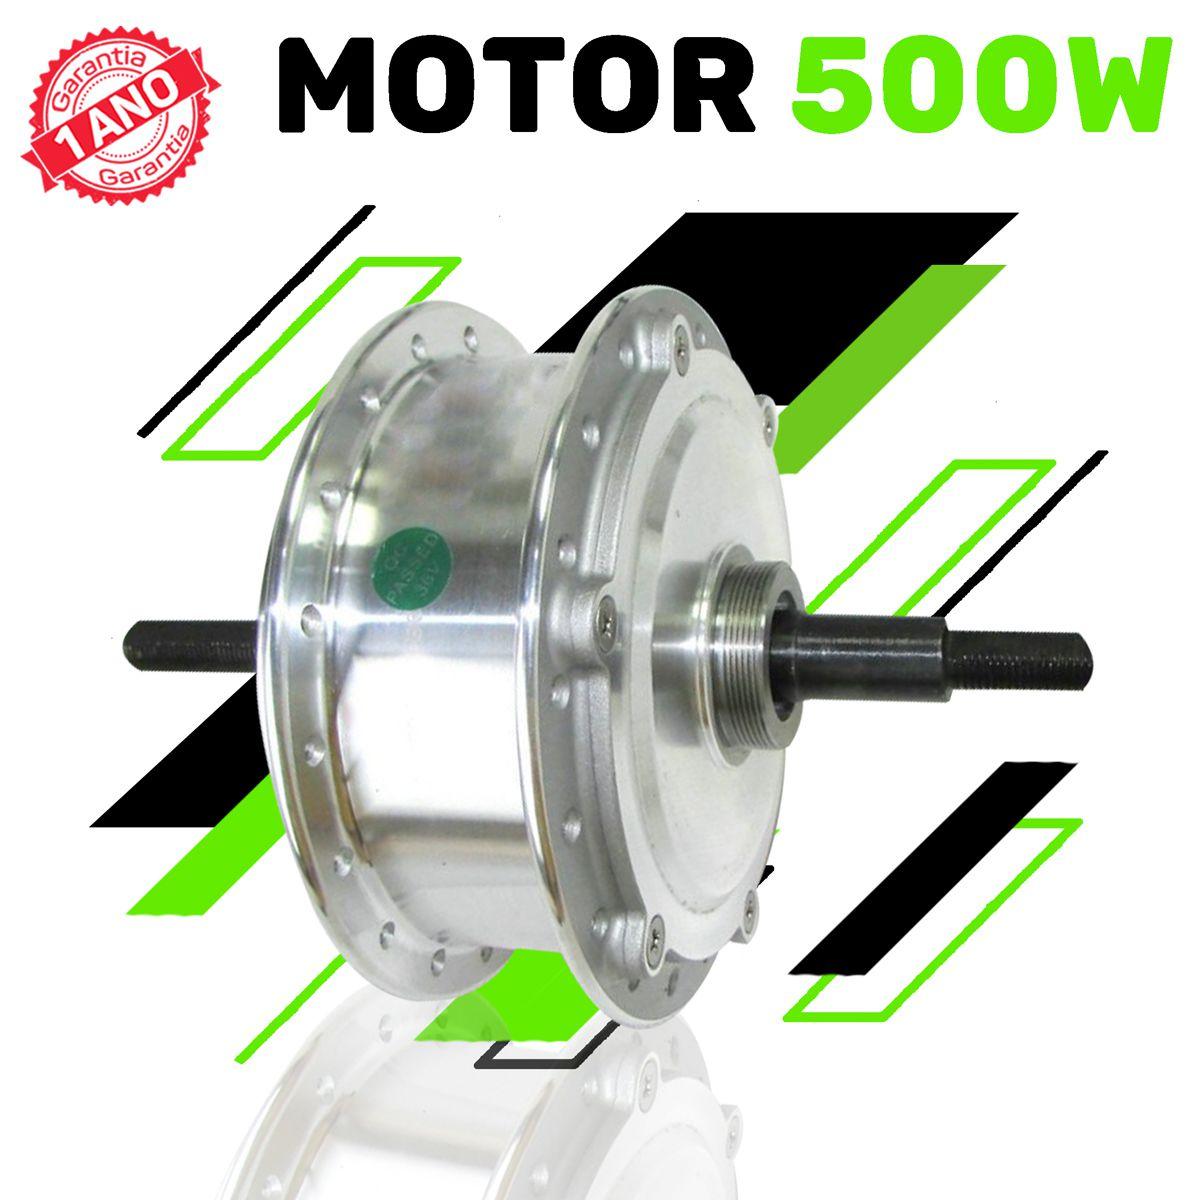 Kit Elétrico para Bicicleta - TecBike - Bateria Preta - 500 Watts 36V - Aro 29